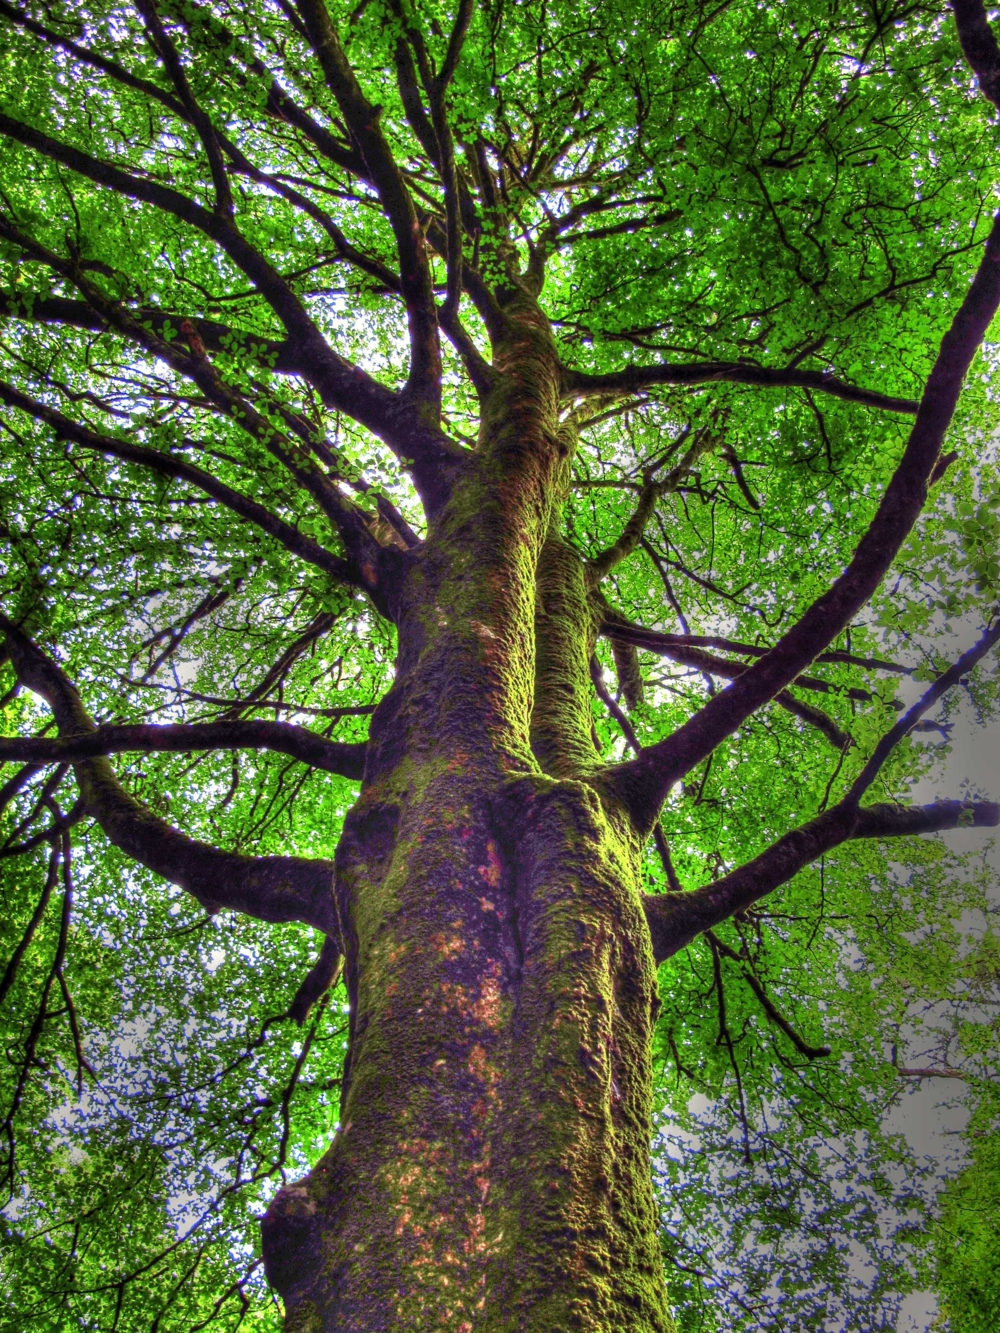 Majestic tree at Torc Waterfall, Ireland photo by susan wellington.